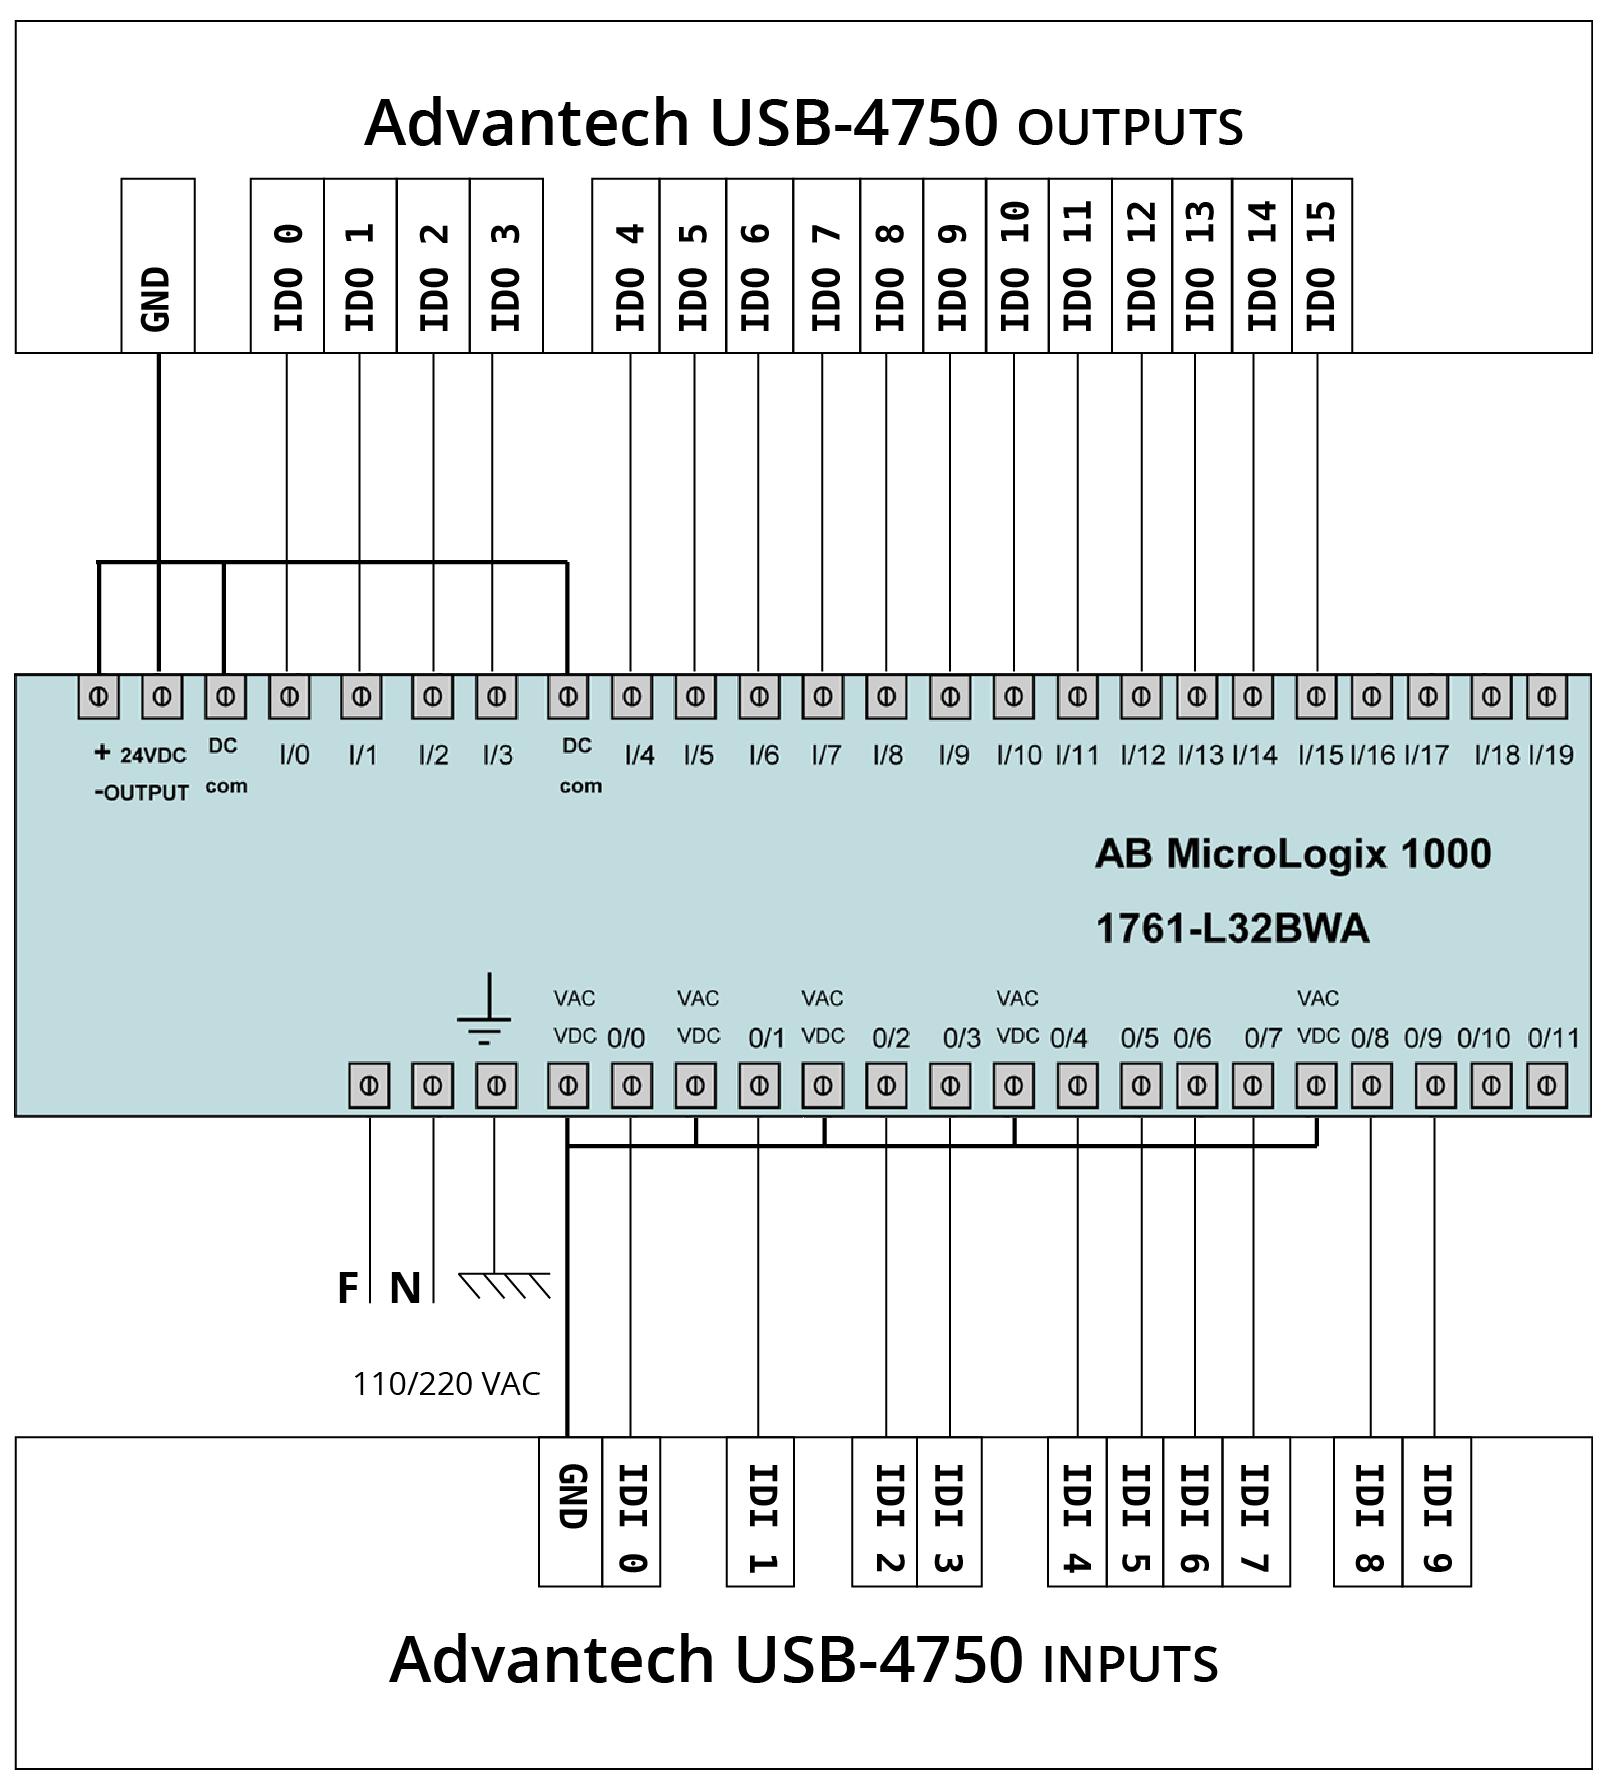 [DIAGRAM_38YU]  Wiring Diagrams - Factory I/O - Documentation | Input Card Wiring Diagram |  | Factory I/O - Documentation